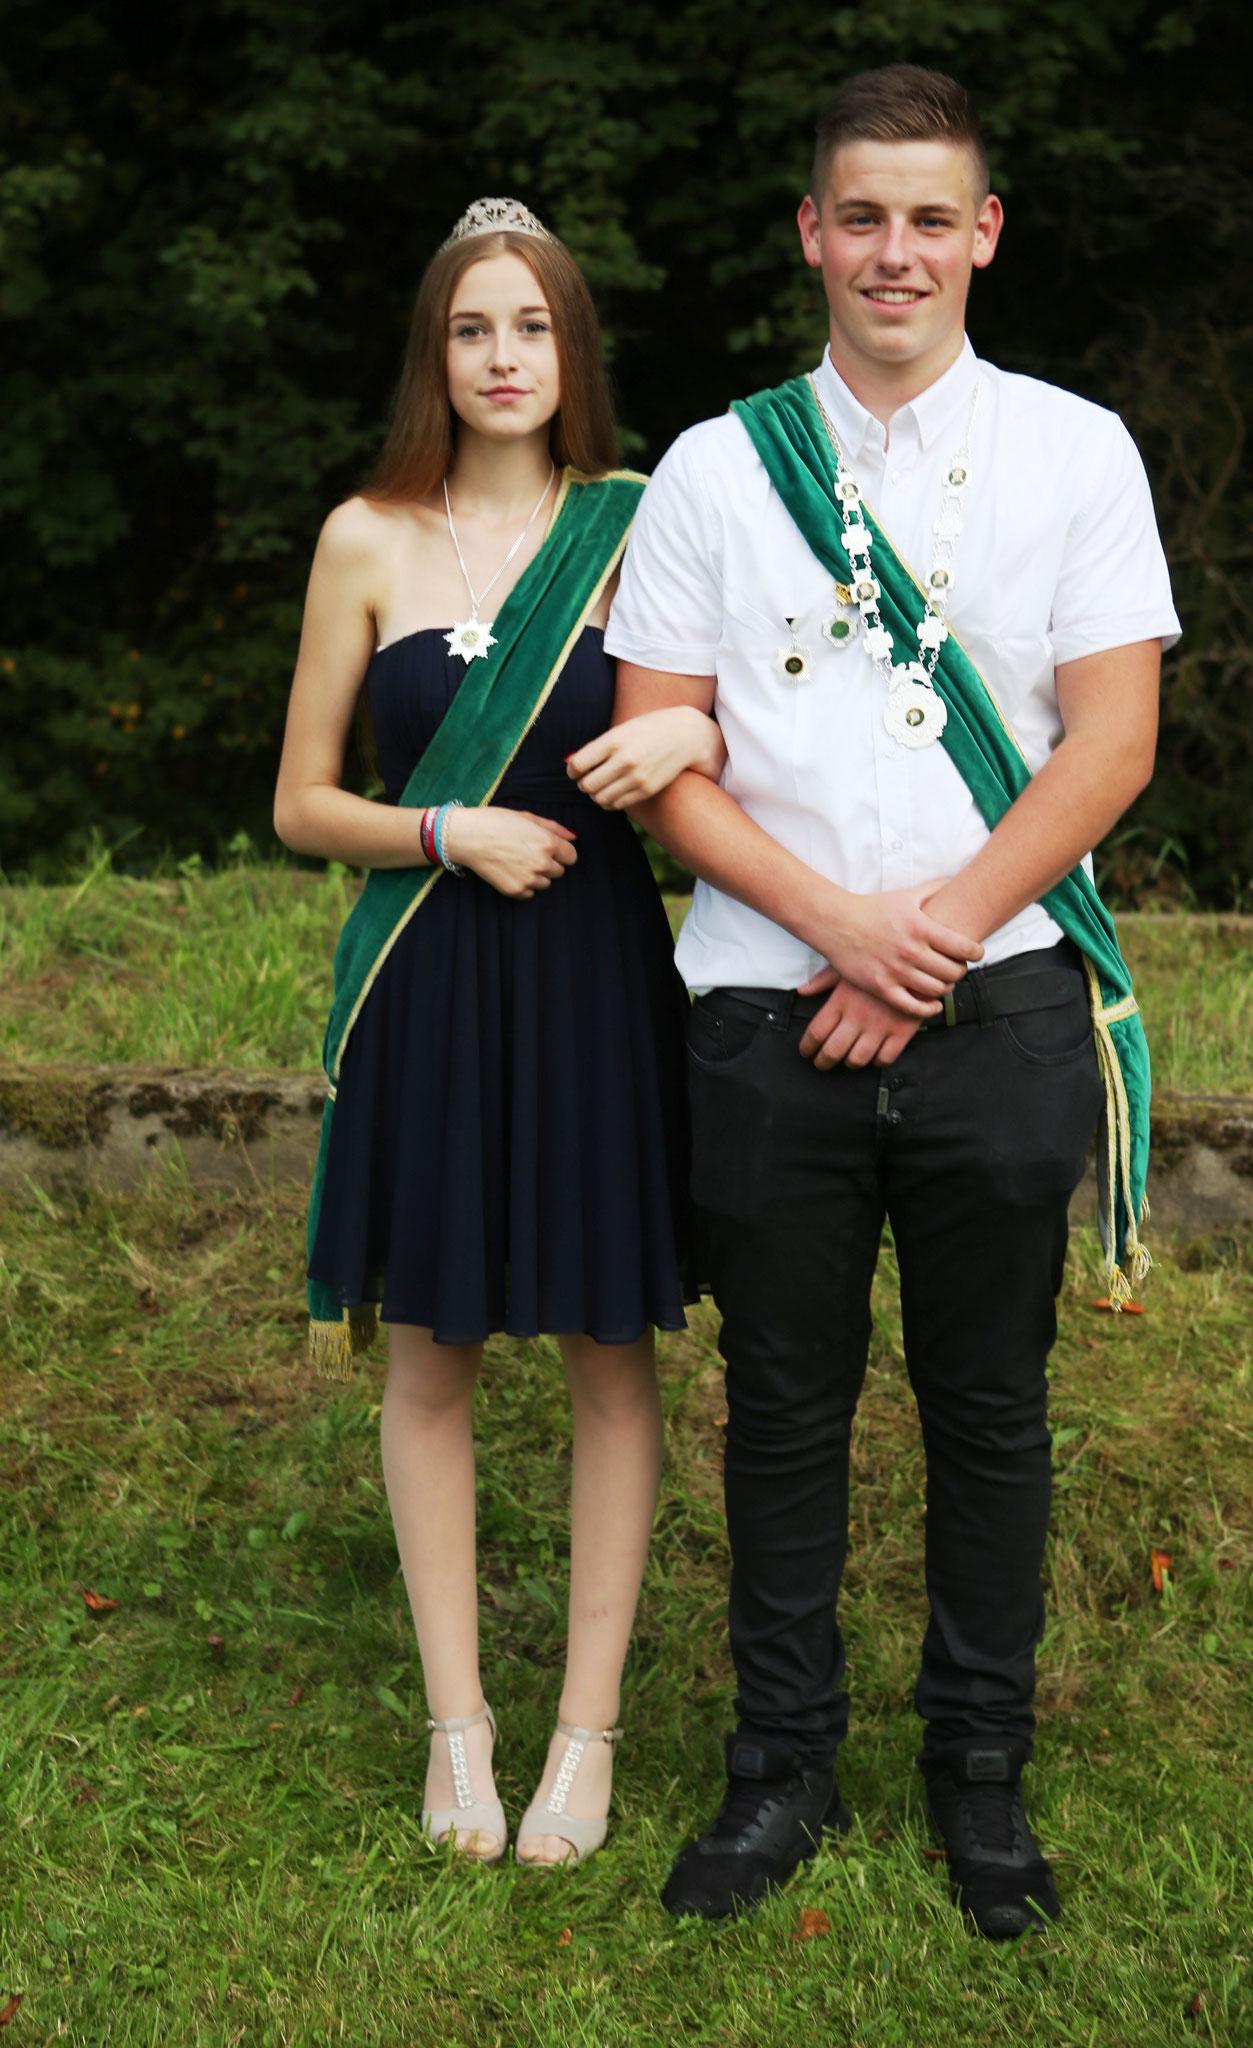 Juungschützenkönigspaar 2017: Marc Jannis Grundmann und Sarah Weber